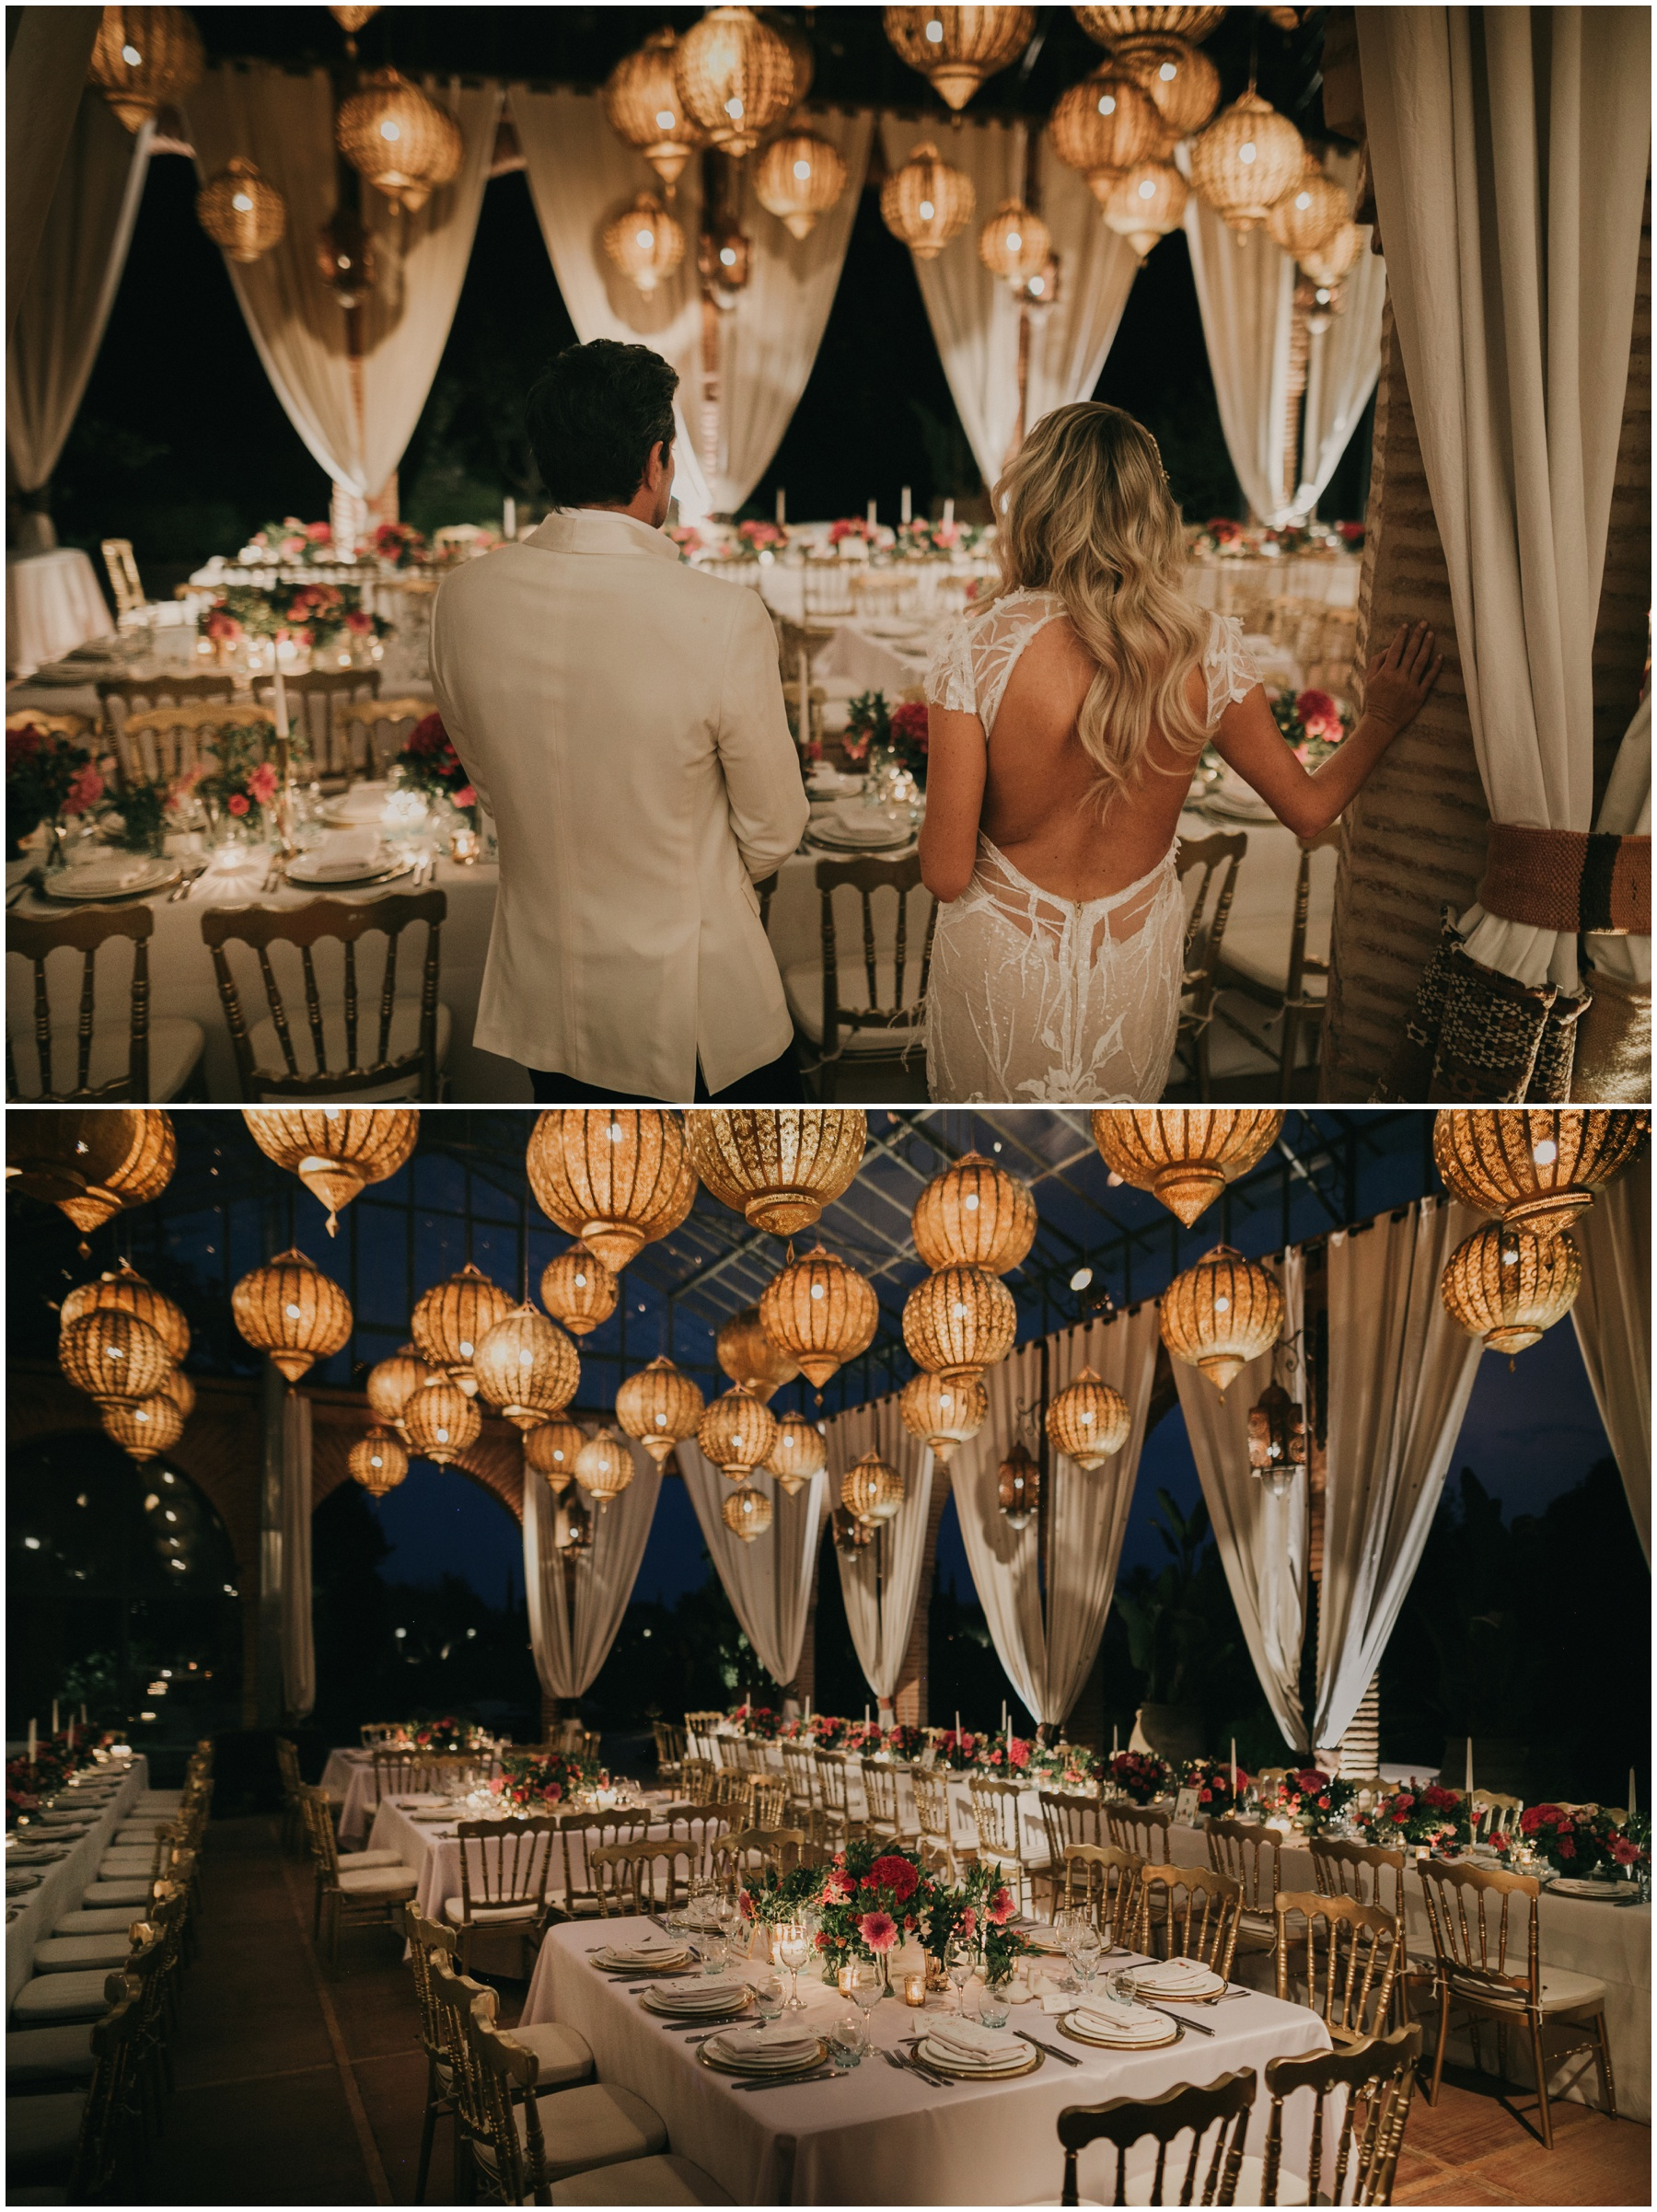 Marrakech Wedding Beldi Coutry Club 069.JPG